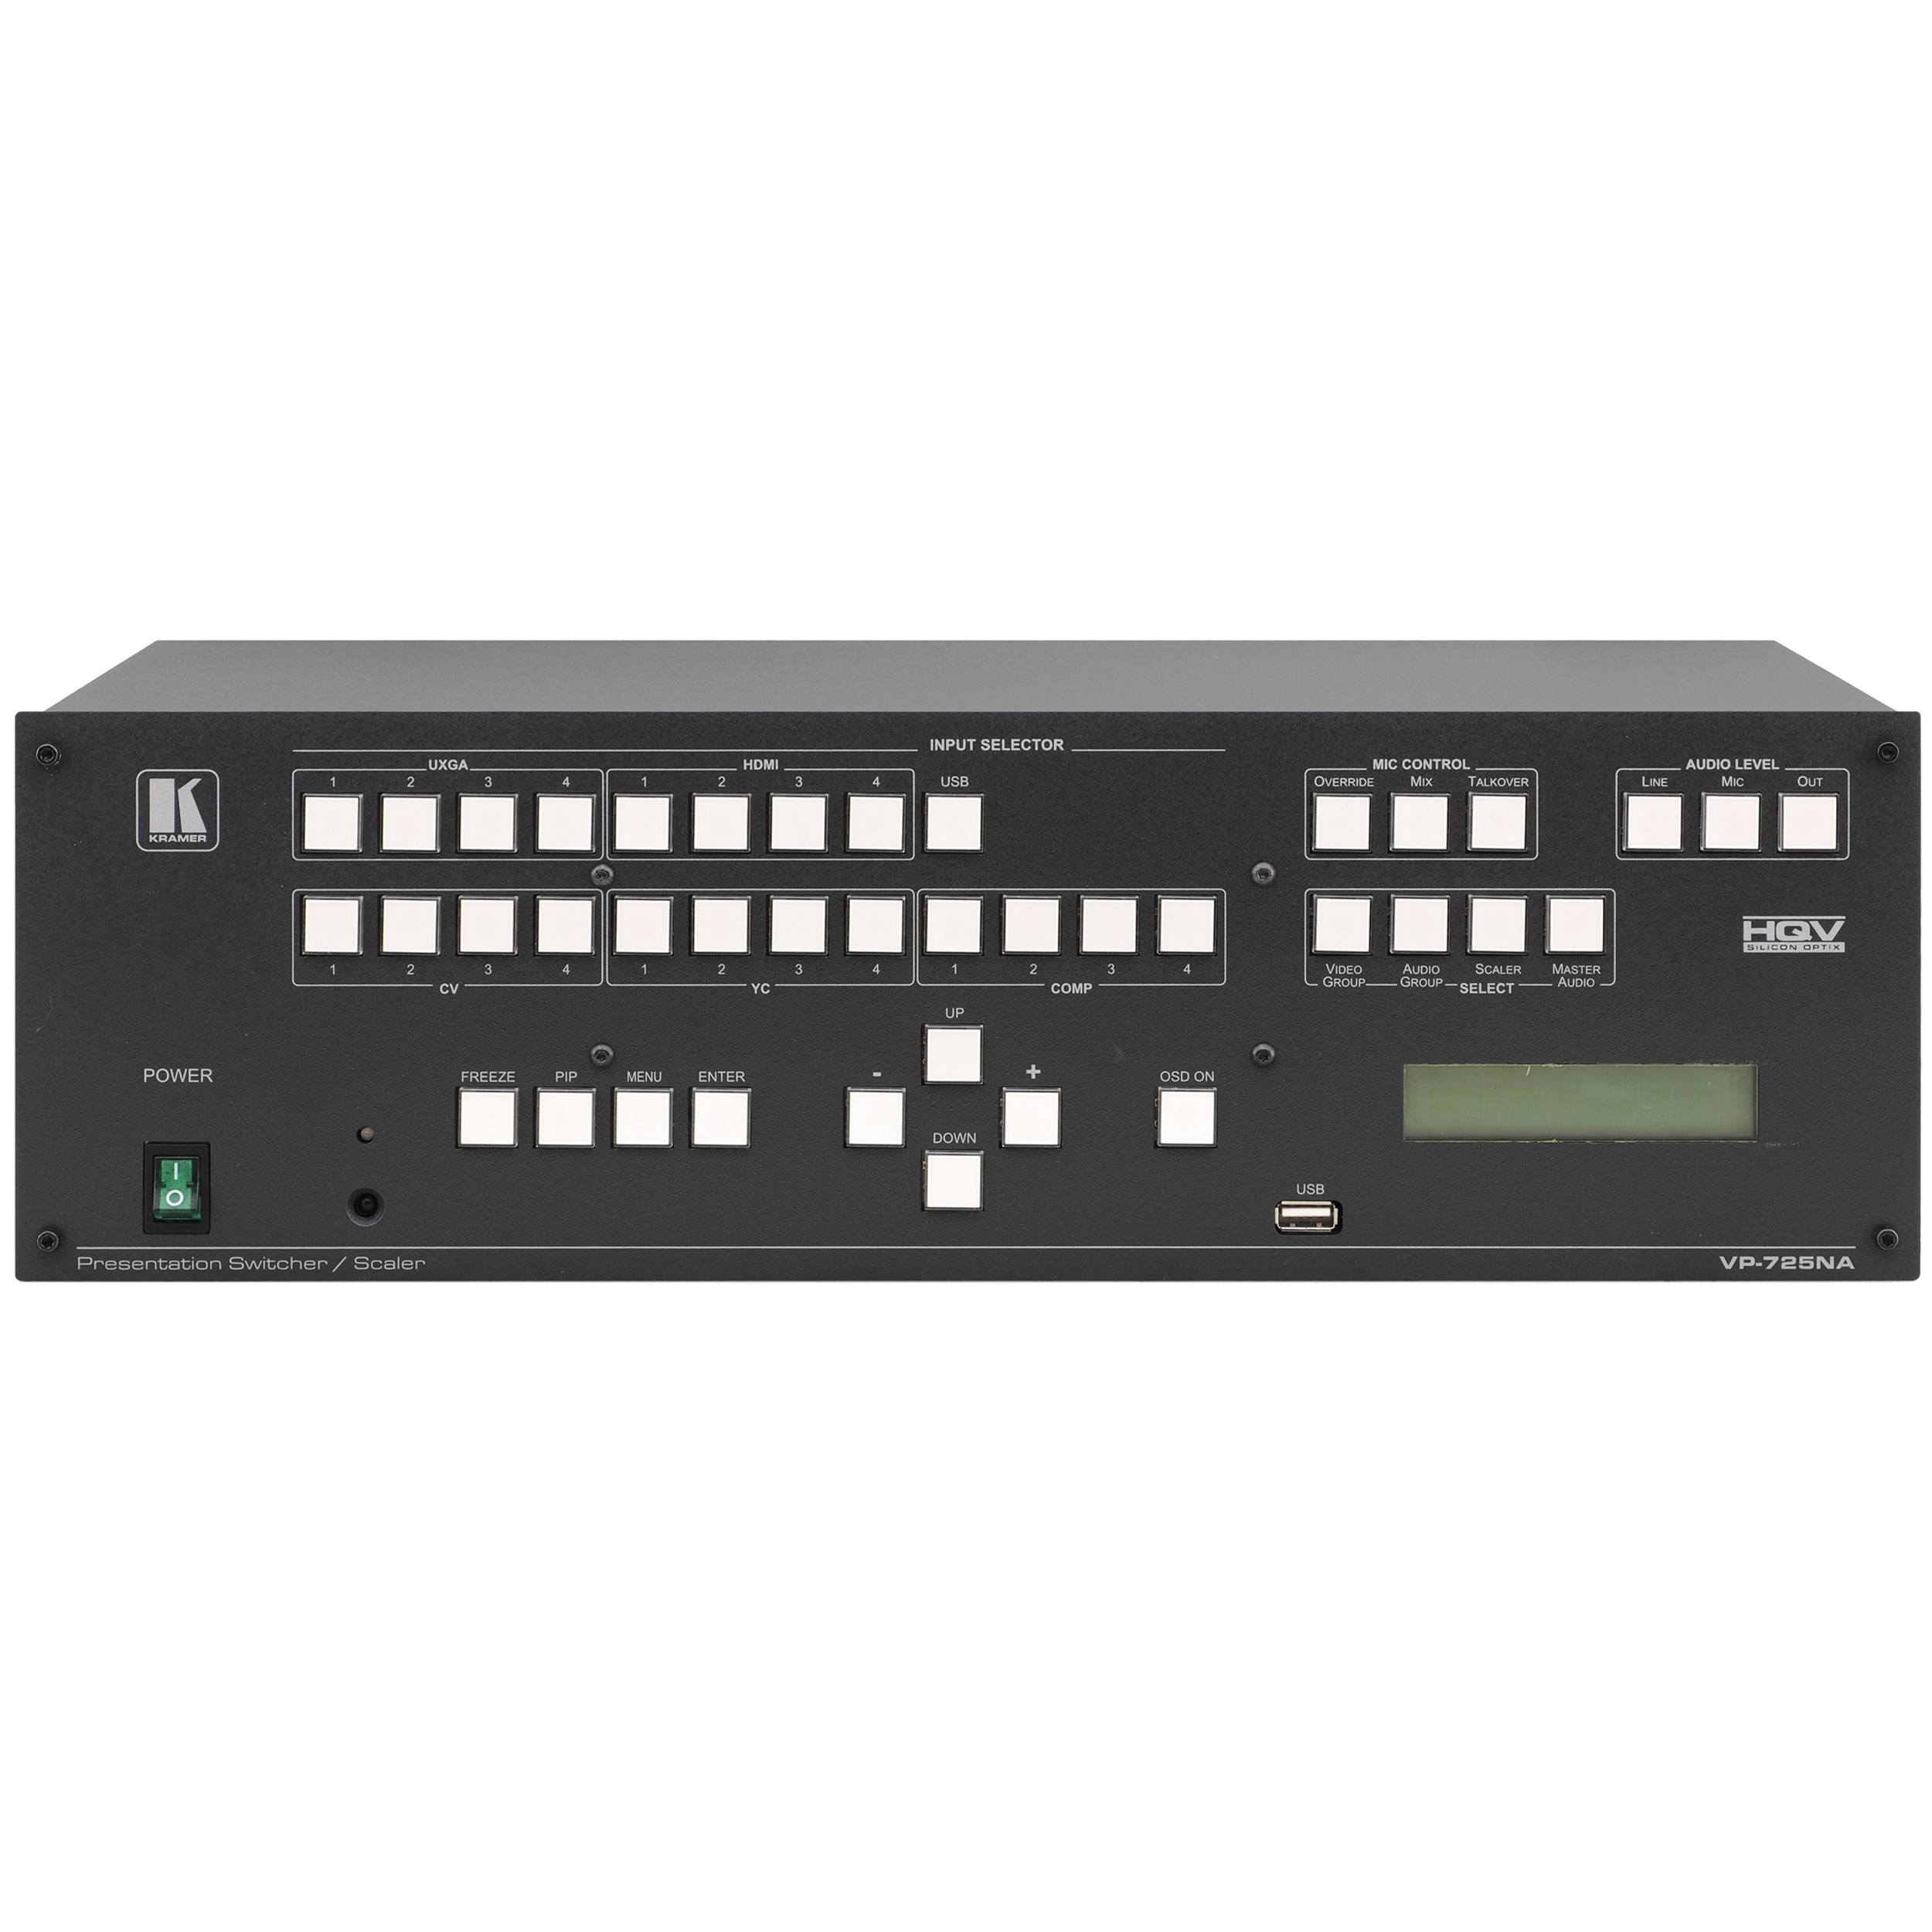 Kramer VP-770 Presentation Scaler-Switcher 64Bit